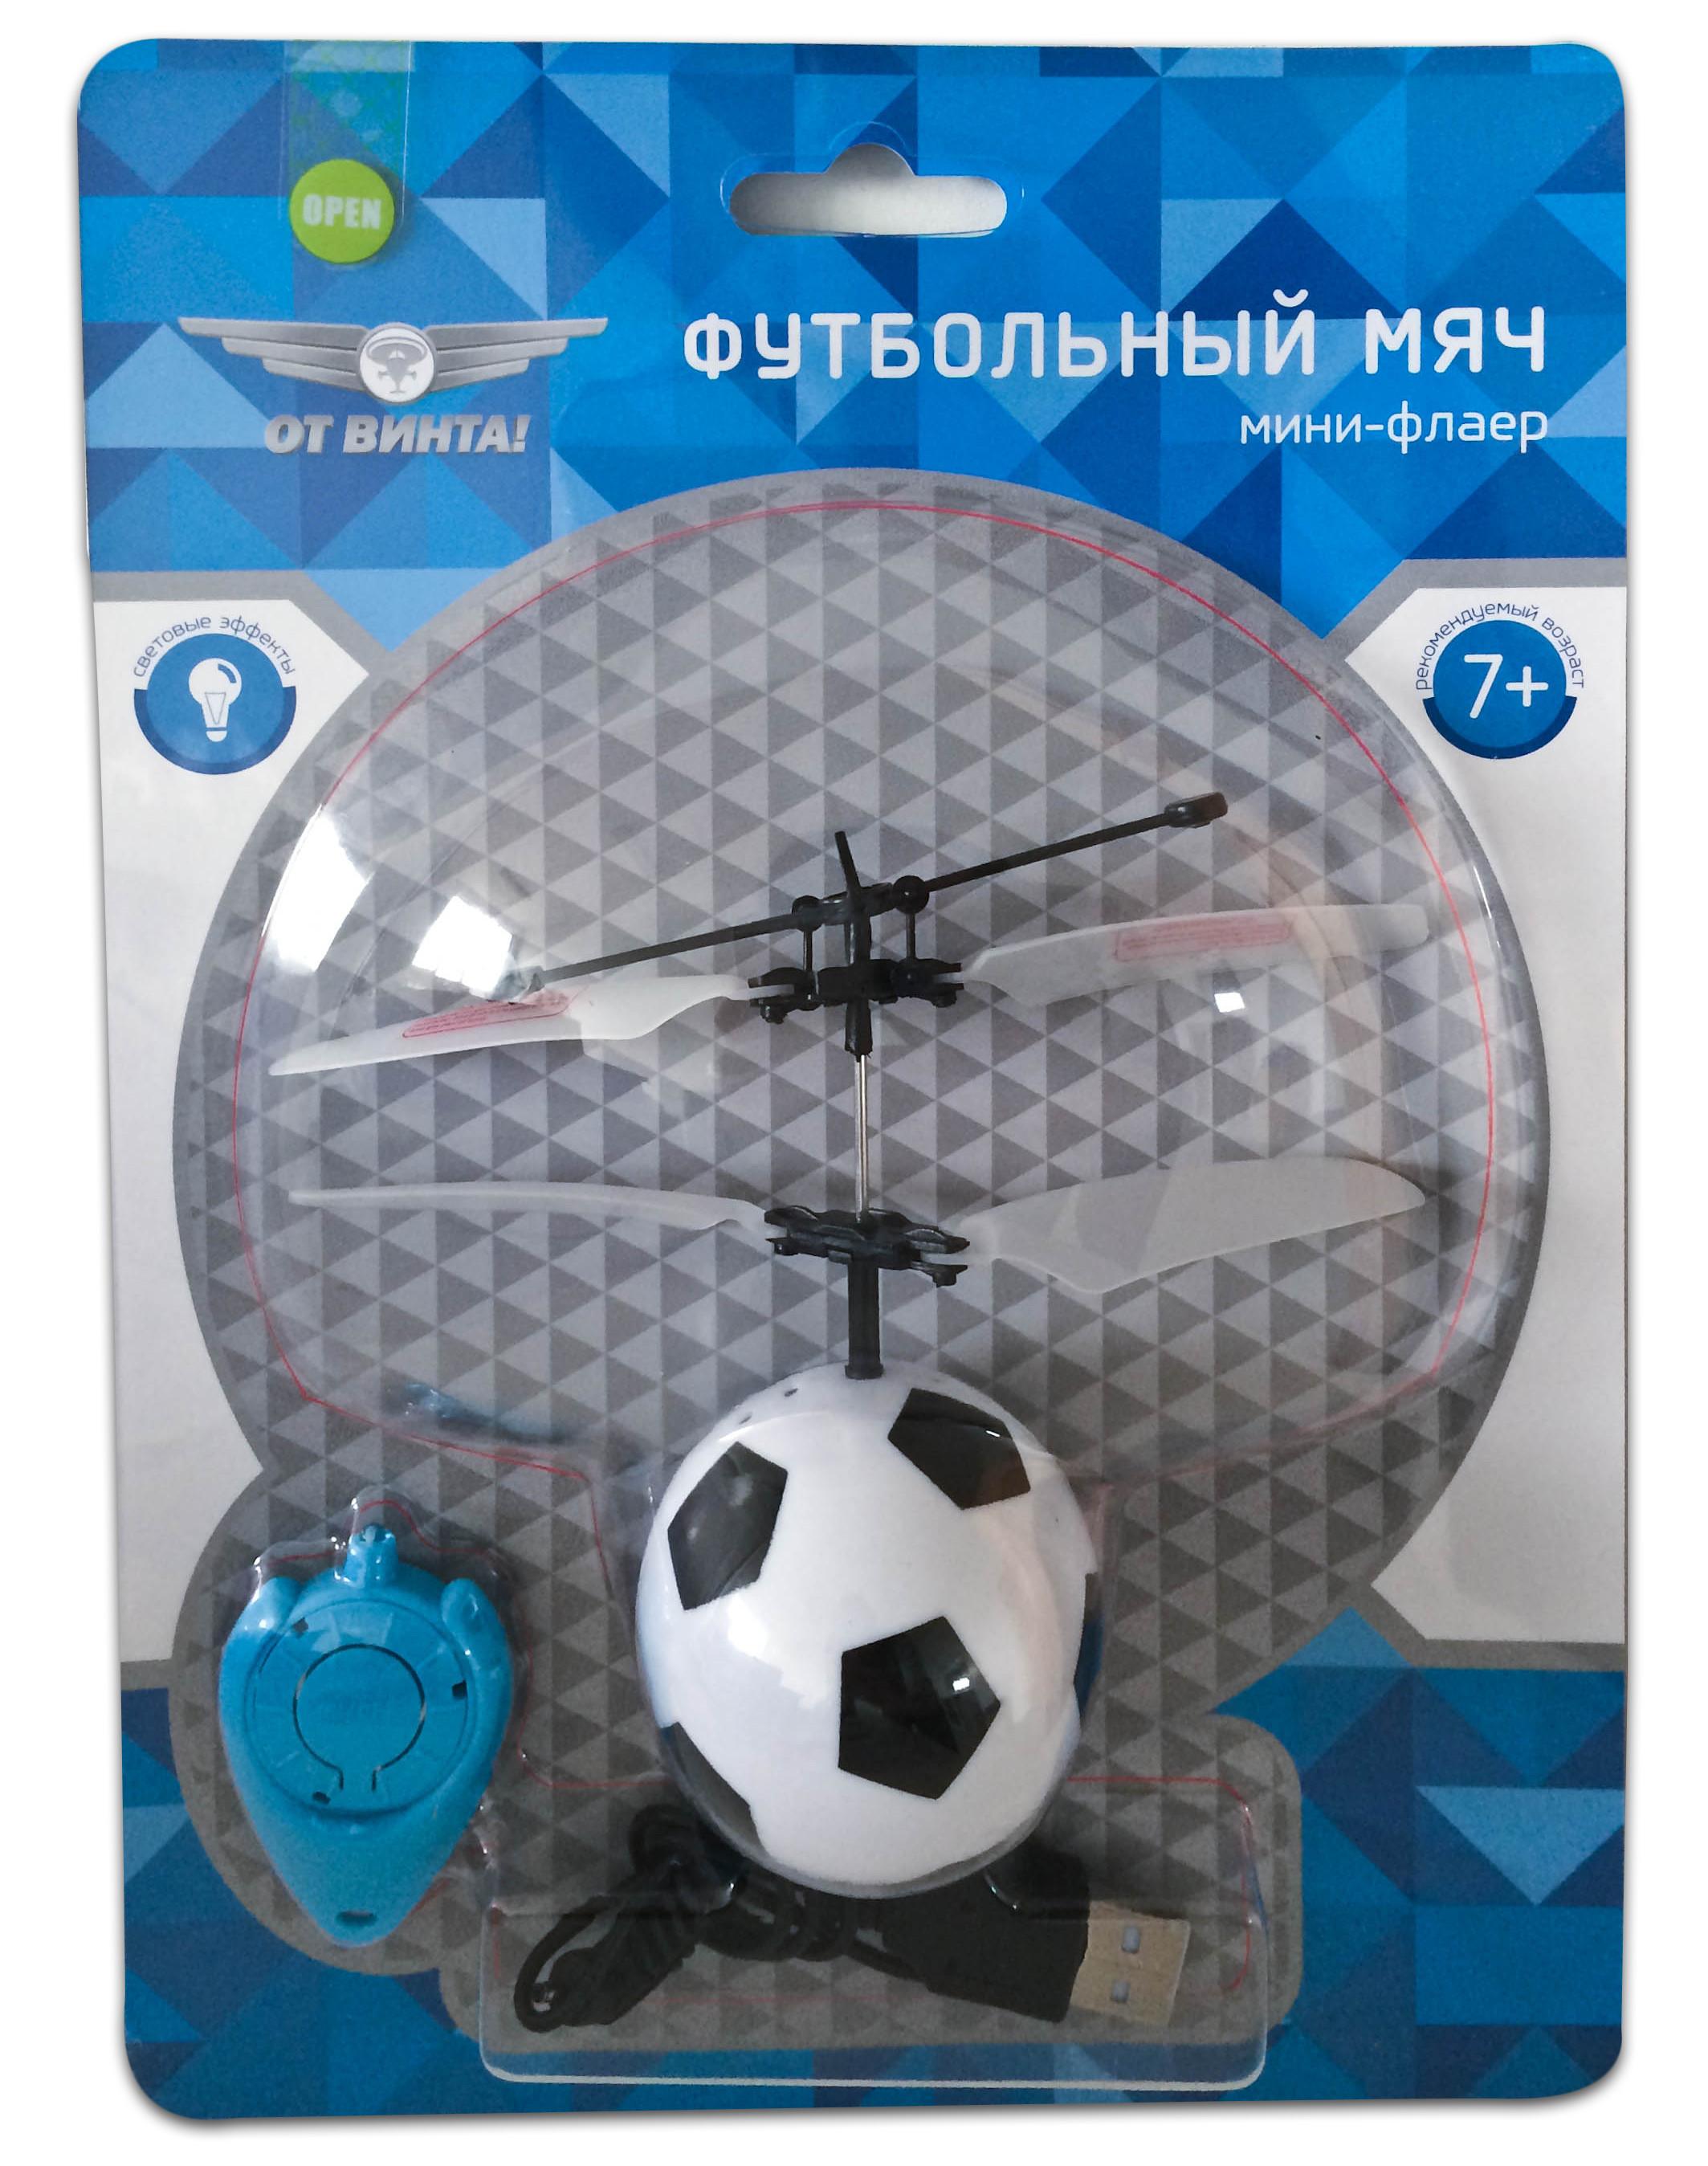 Мини-флаер От винта! Футбольный мяч